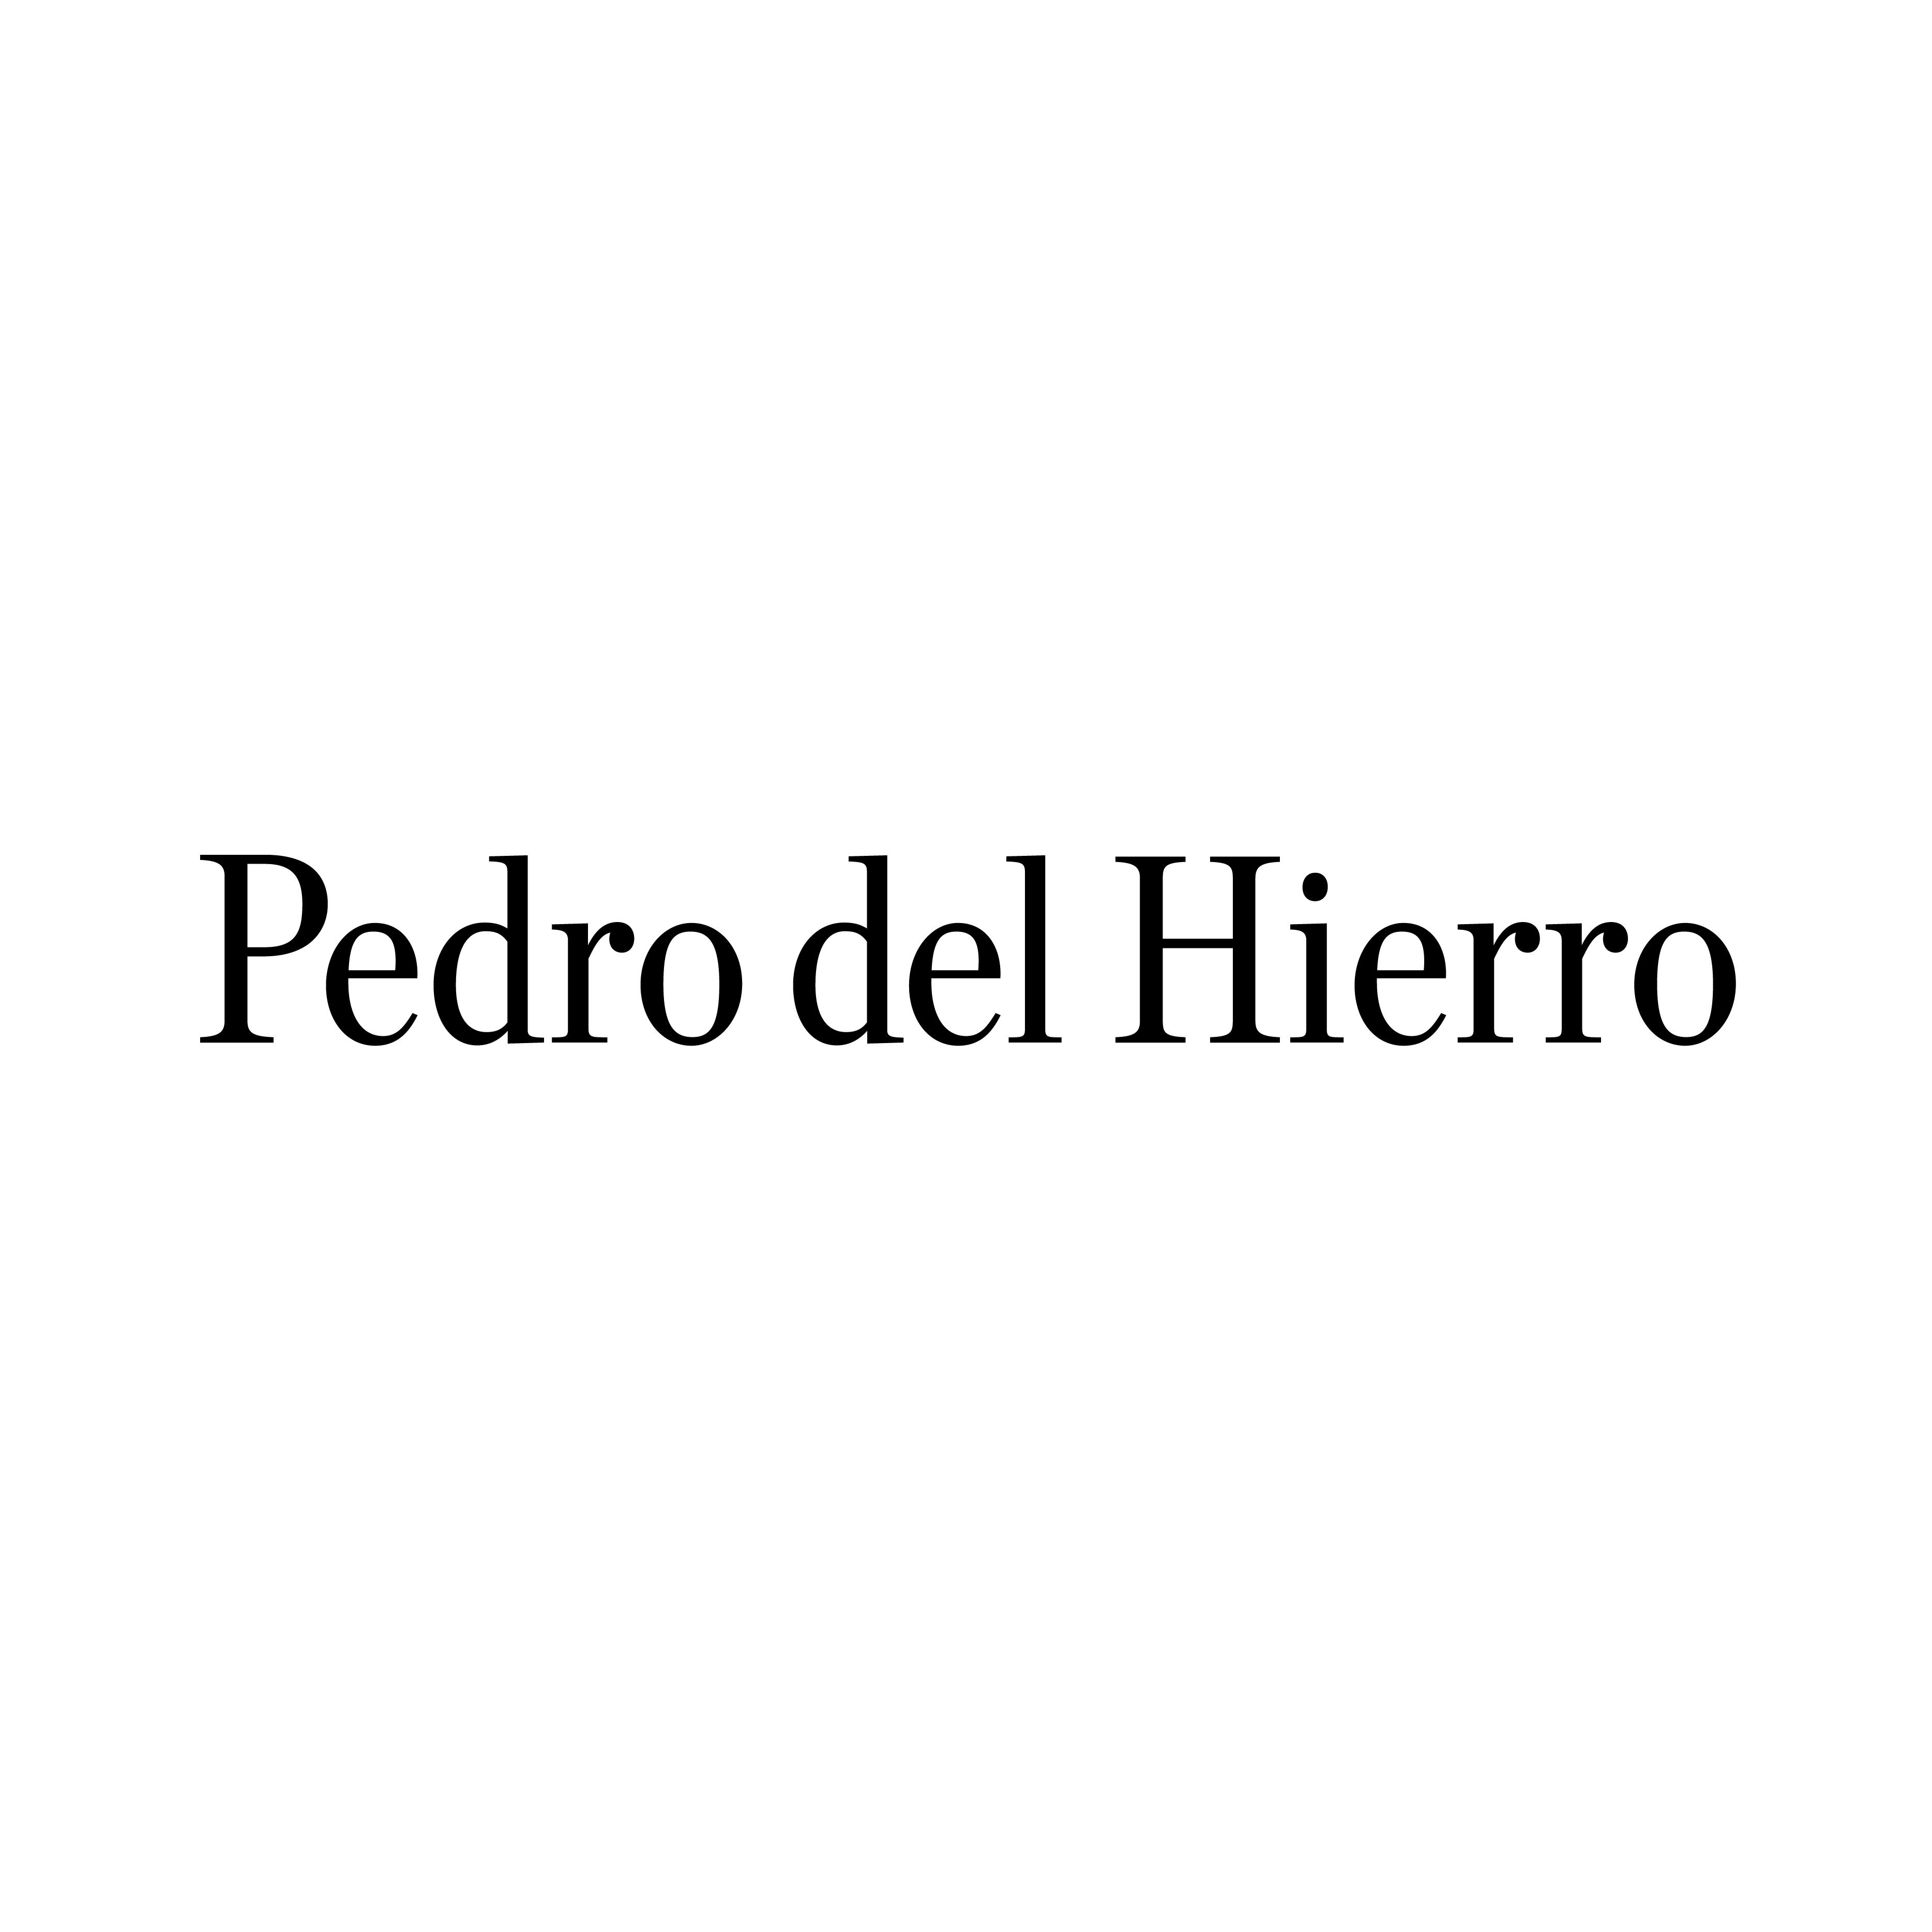 Logotipo Pedro Del Hierro